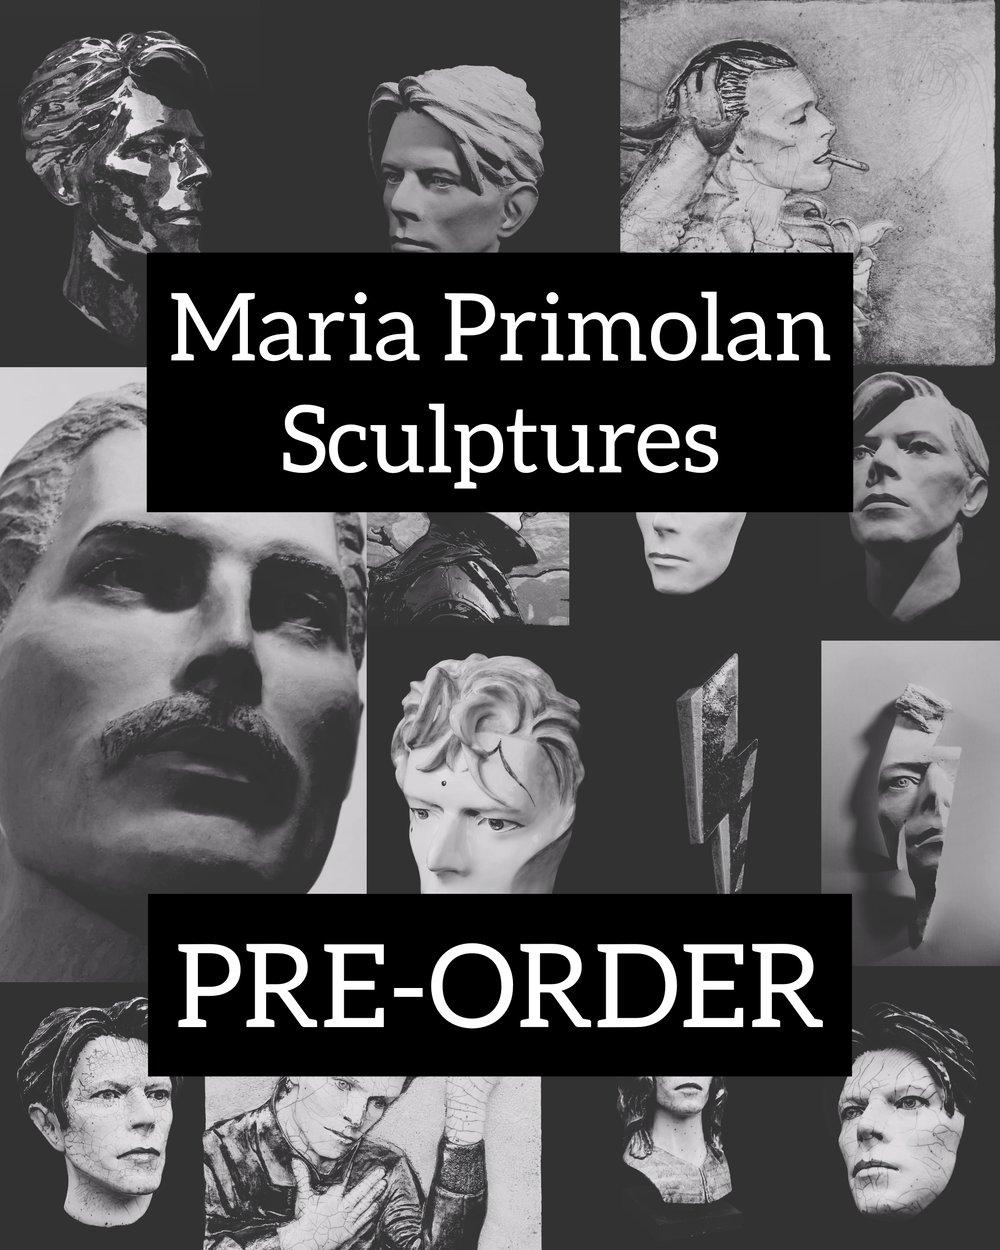 Pre-Order Sculptures by Maria Primolan